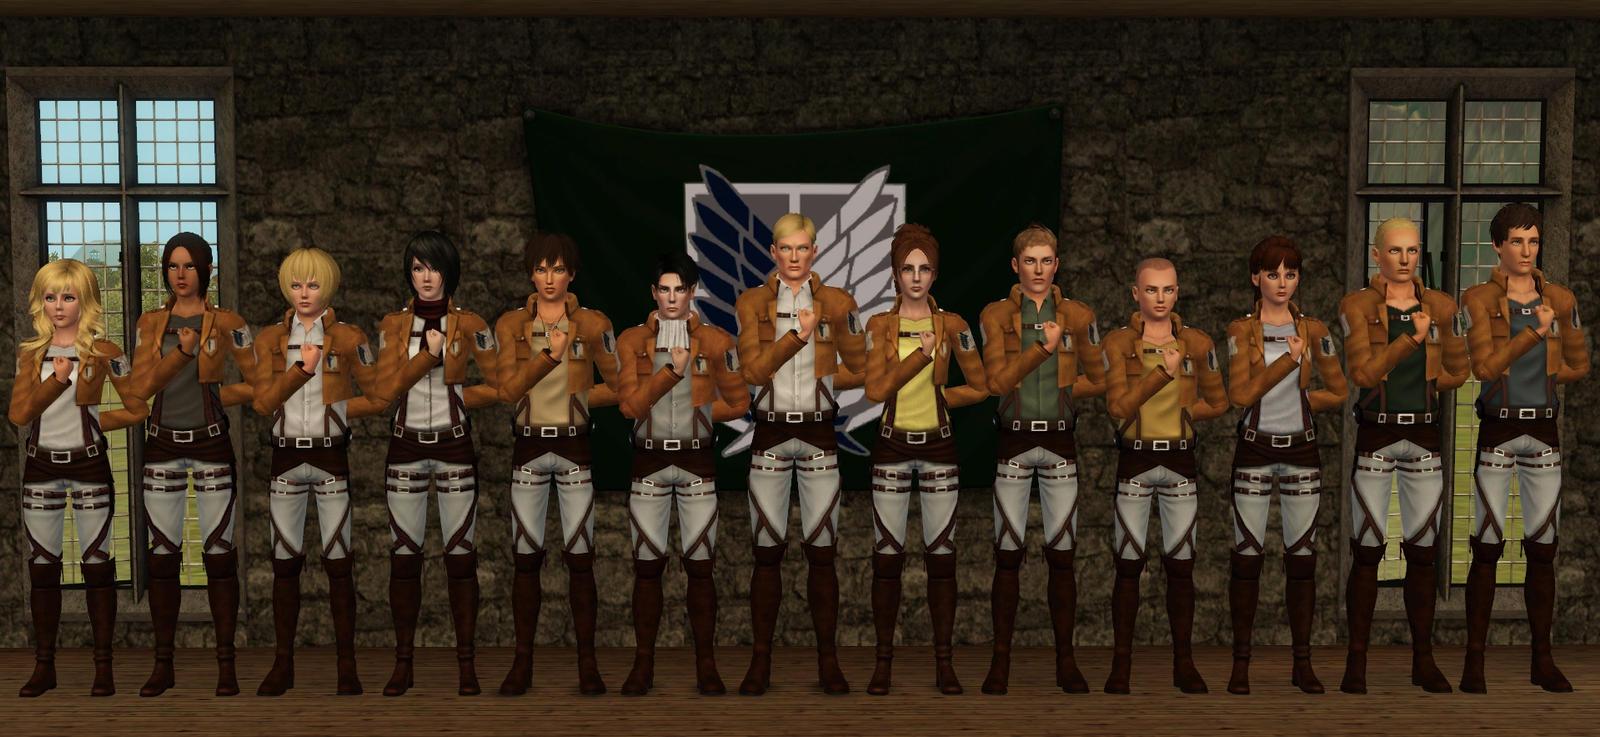 attack on titan corps - photo #20